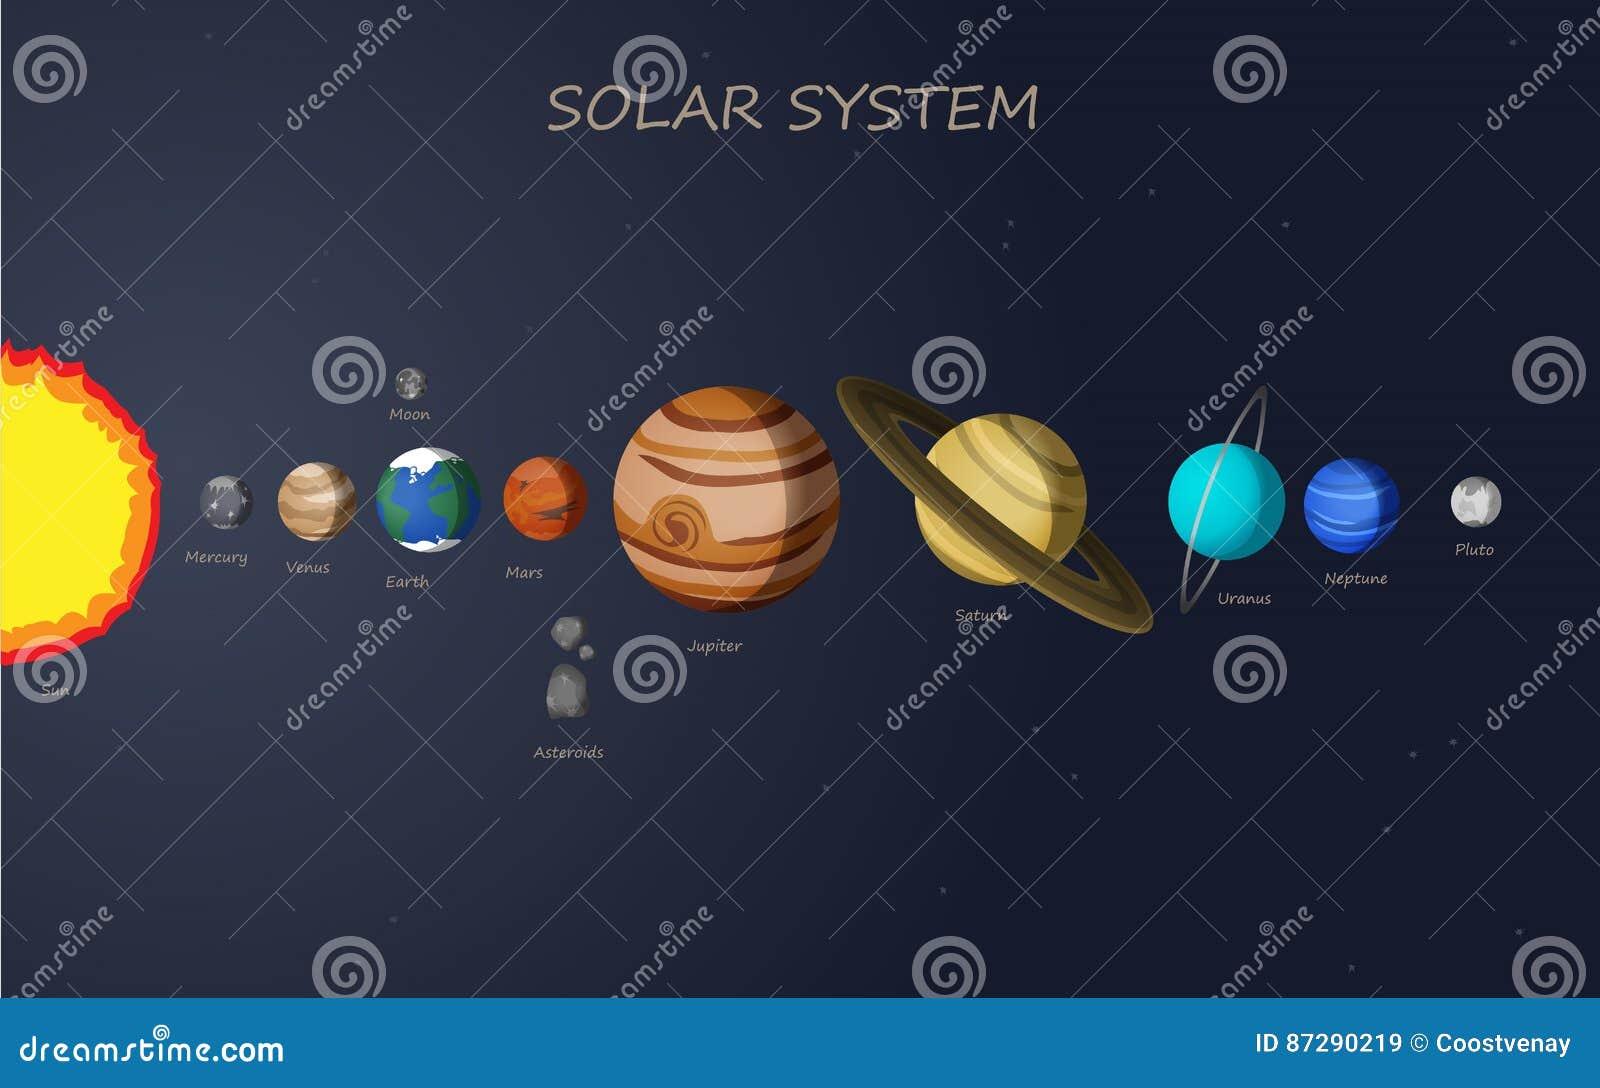 Solar system map stock vector. Illustration of earth - 87290219